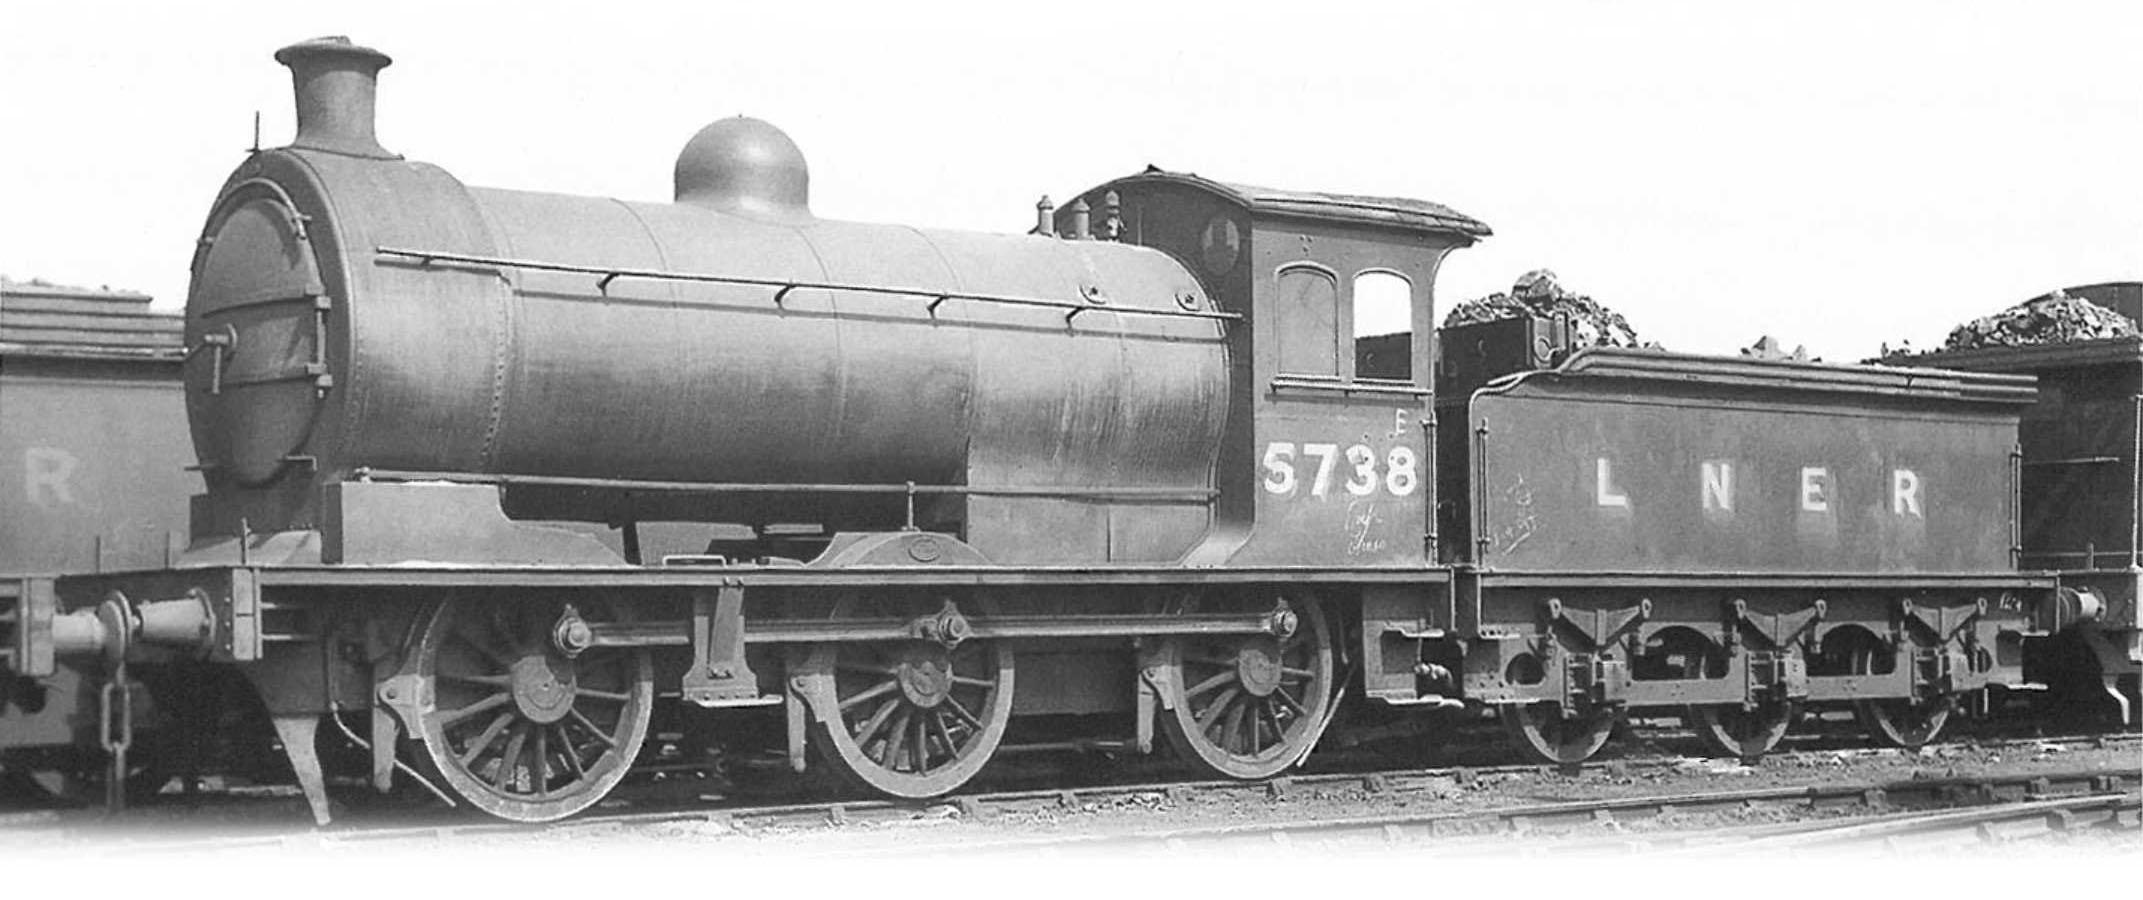 5738. Date Unknown. ©via Oxford Rail